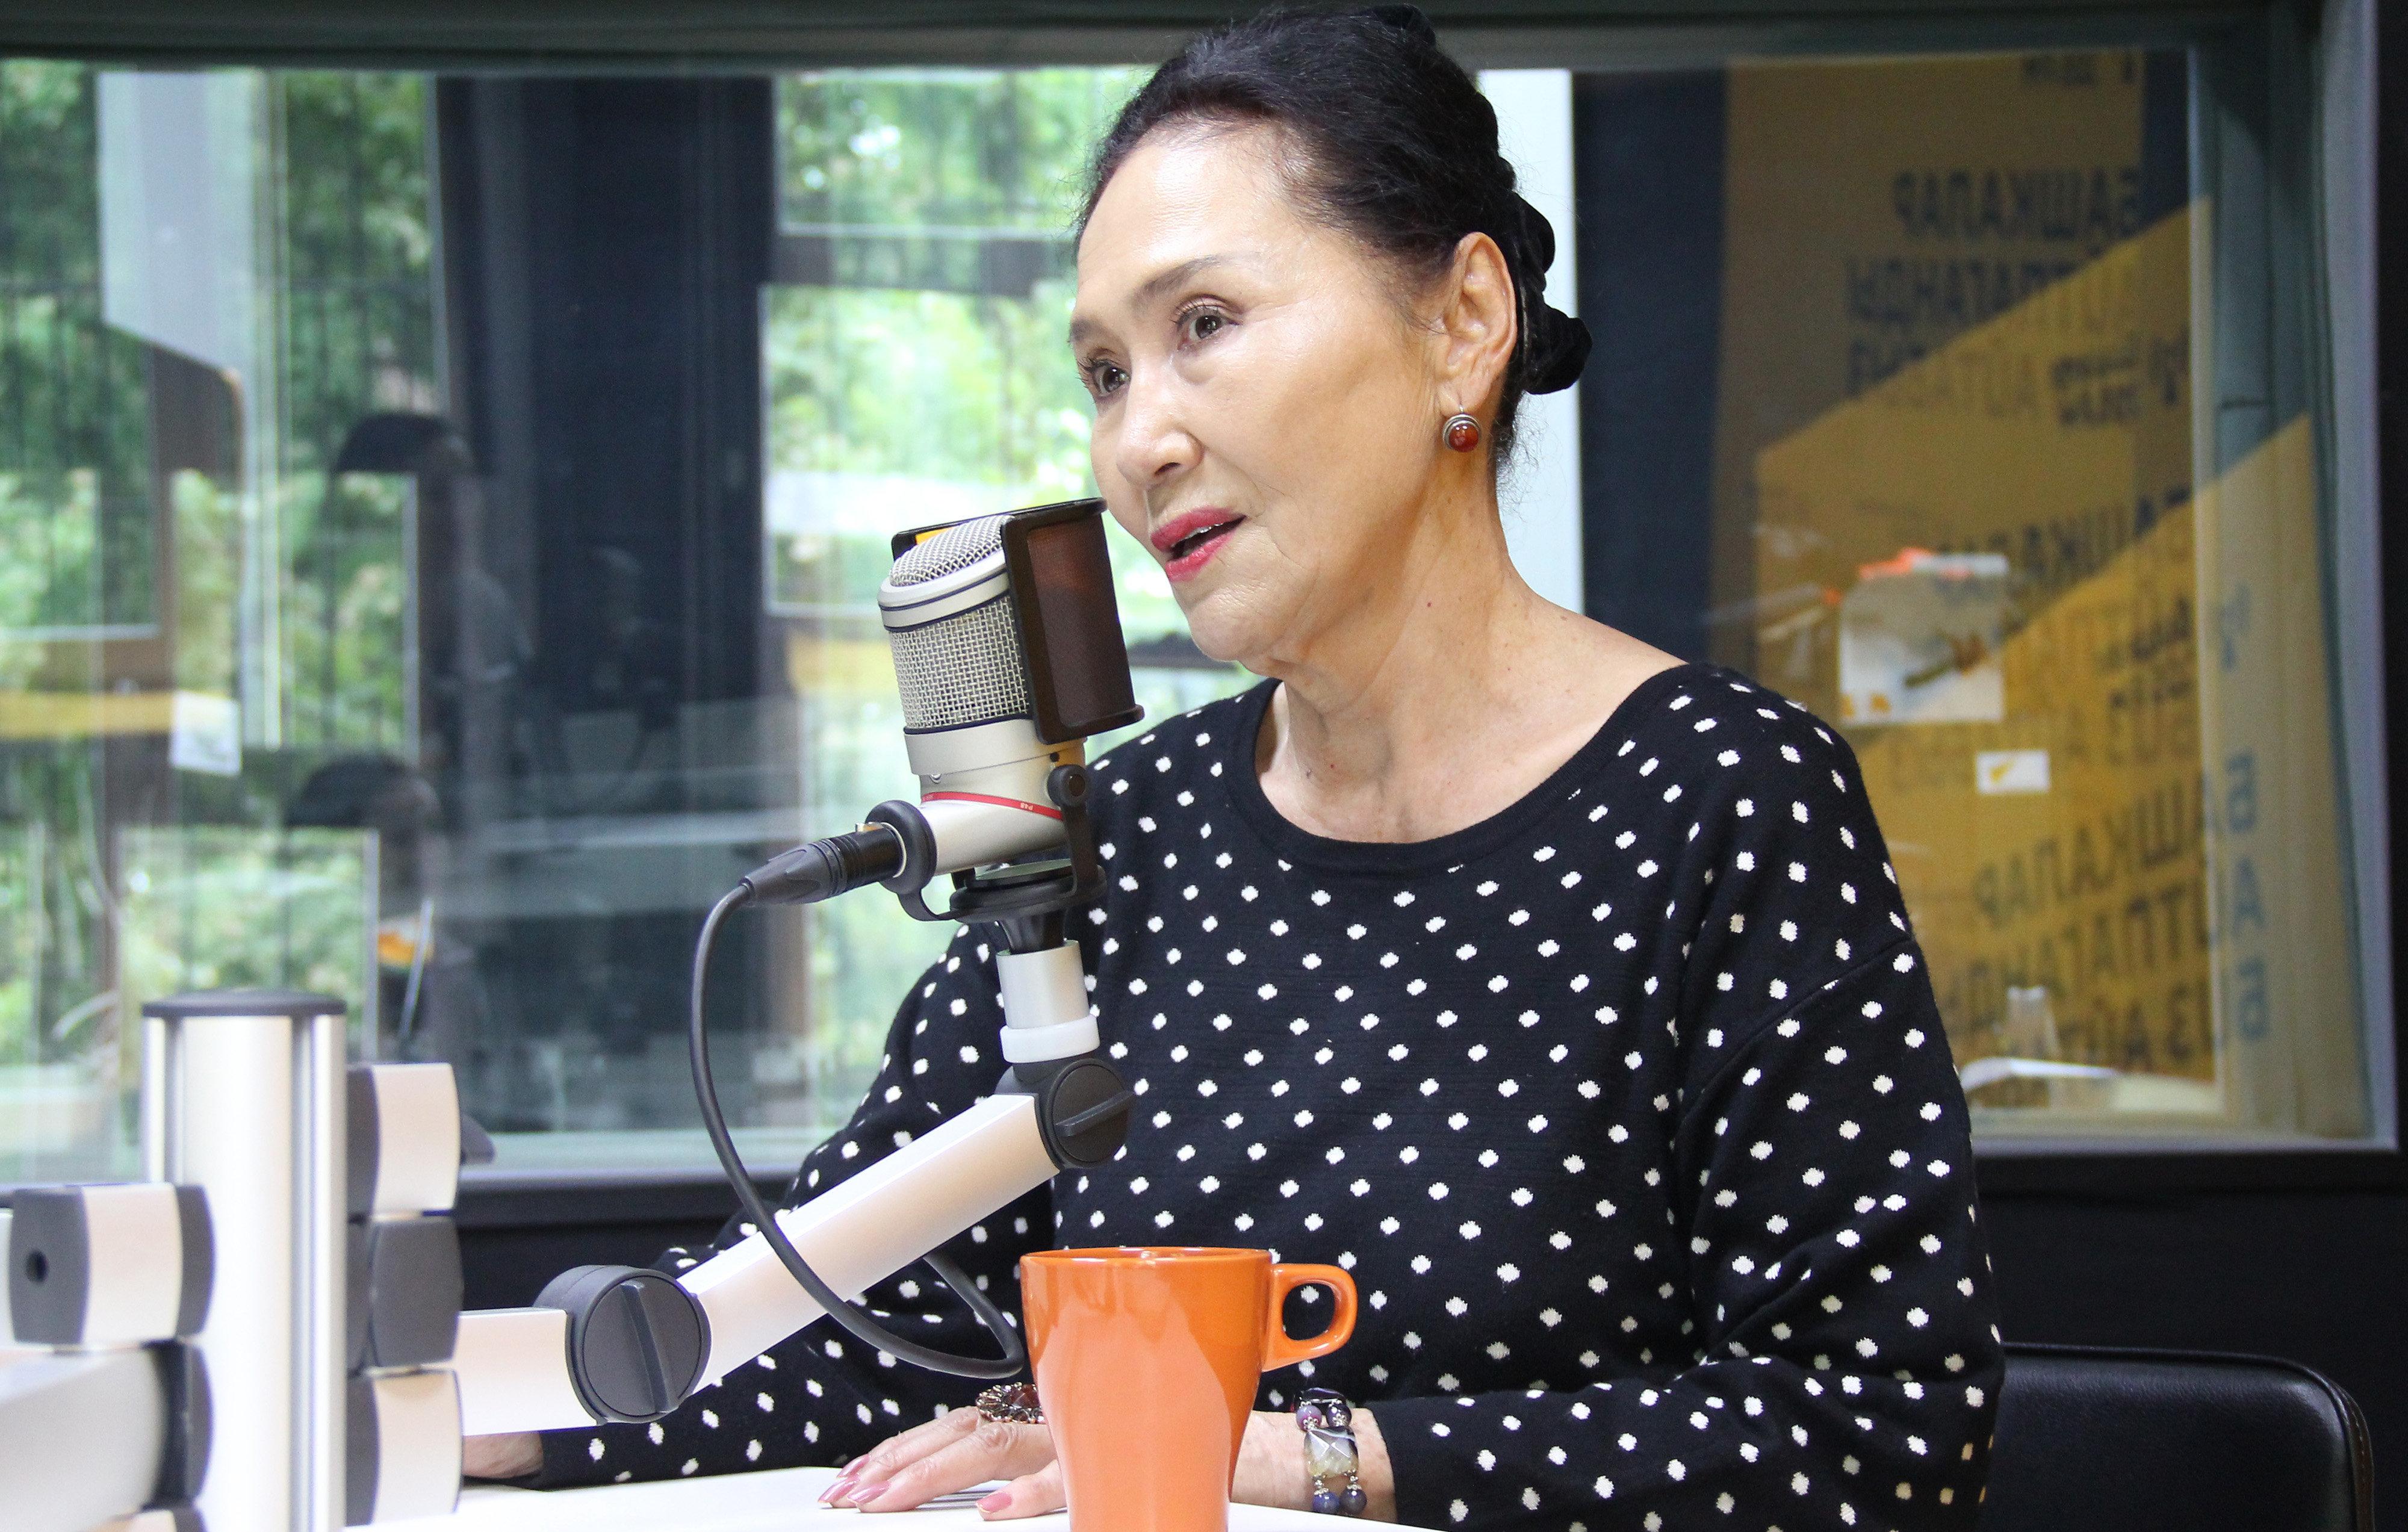 Народная актриса Кыргызстана, артистка театра и кино Назира Мамбетова во время интервью Sputnik Кыргызстан